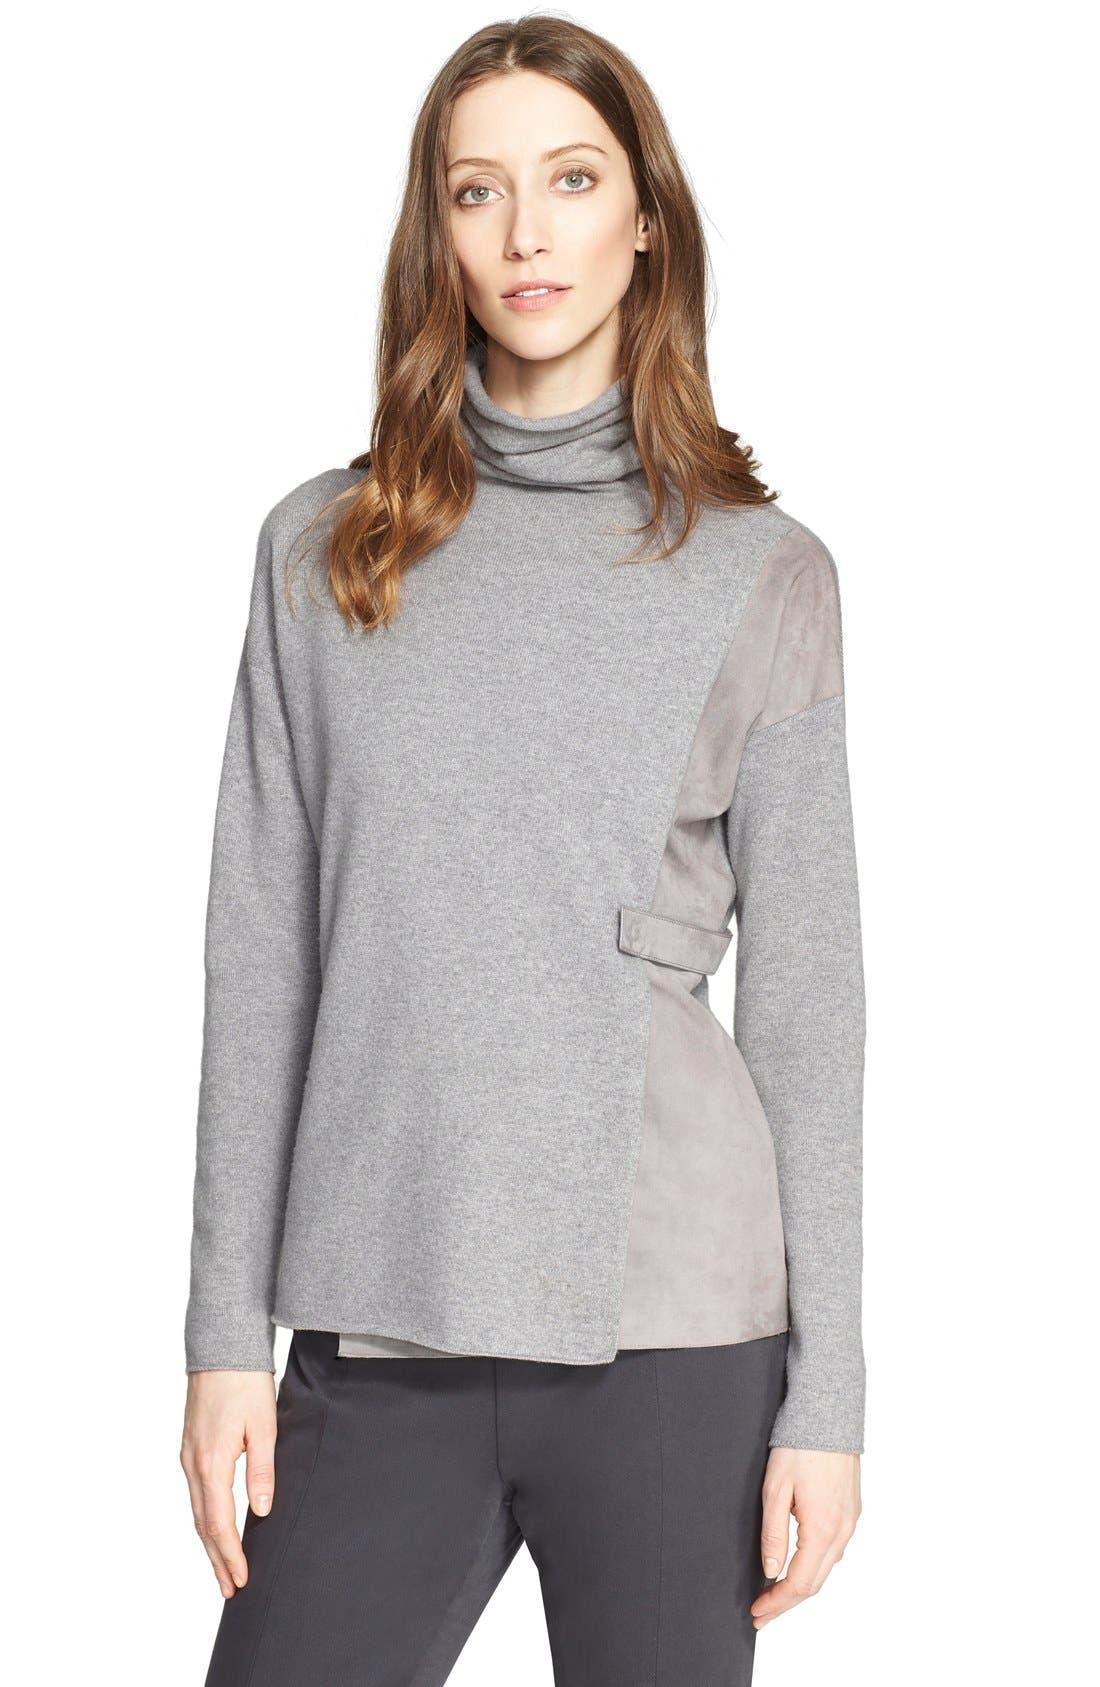 Alternate Image 1 Selected - Fabiana Filippi Suede Contrast Wool Blend Turtleneck Sweater